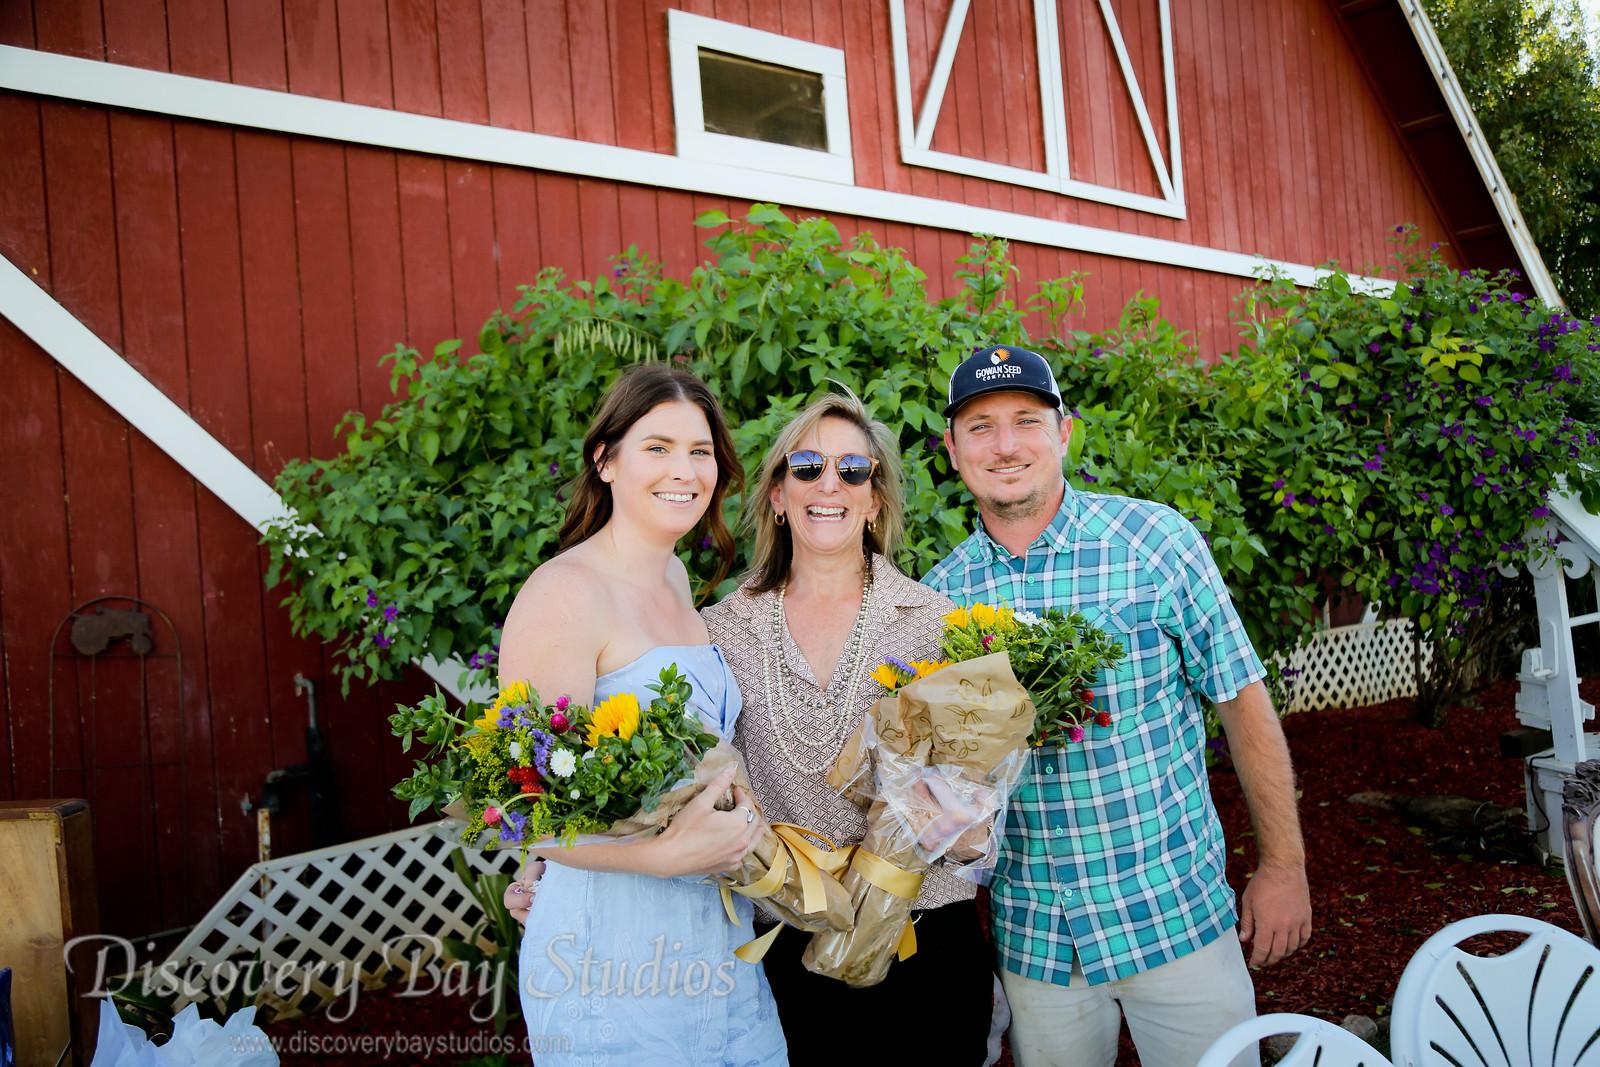 Meredith Nunn - Farmer's Daughter